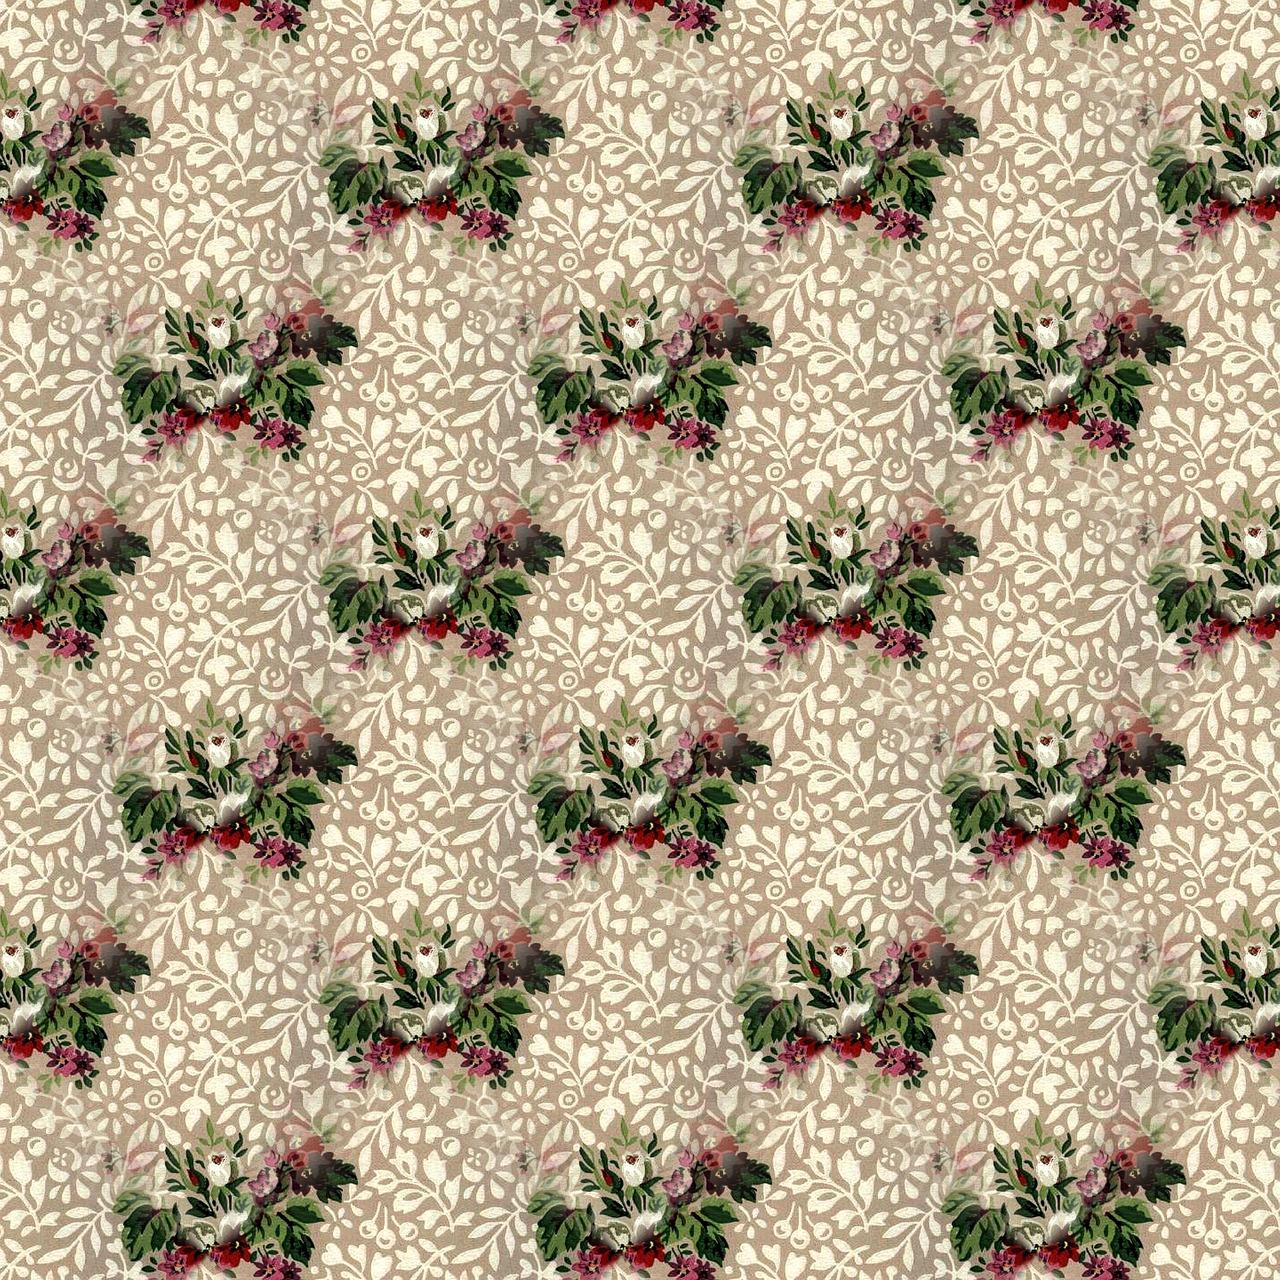 Floral Pattern Vintage Antique Seamless Decorative Free Image